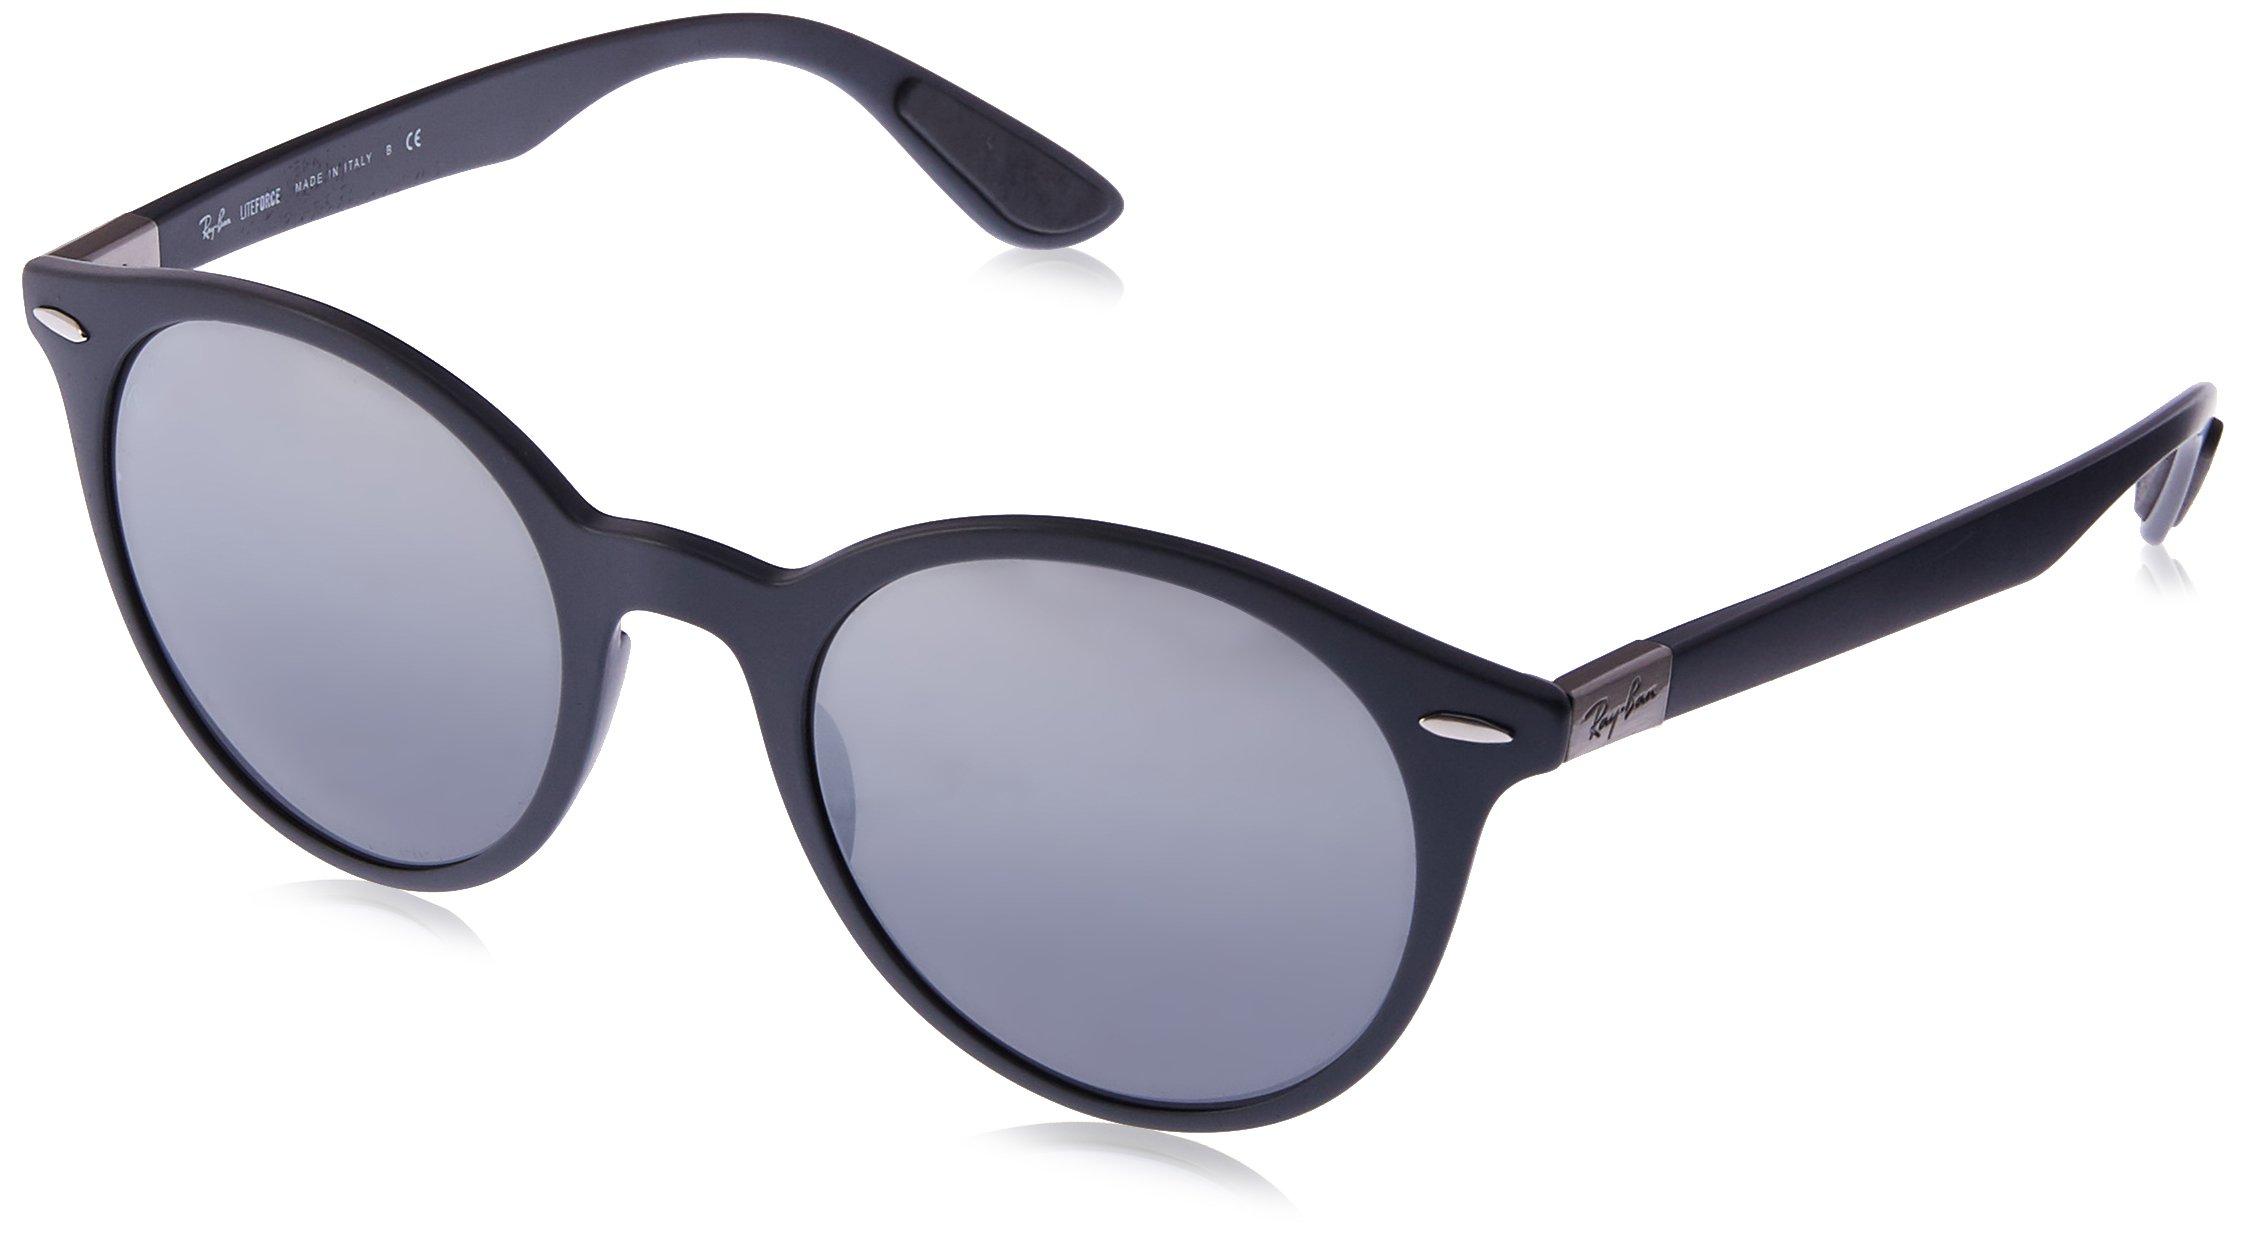 Ray-Ban RB4296 Round Sunglasses, Matte Grey/Grey Gradient Mirror, 50 mm